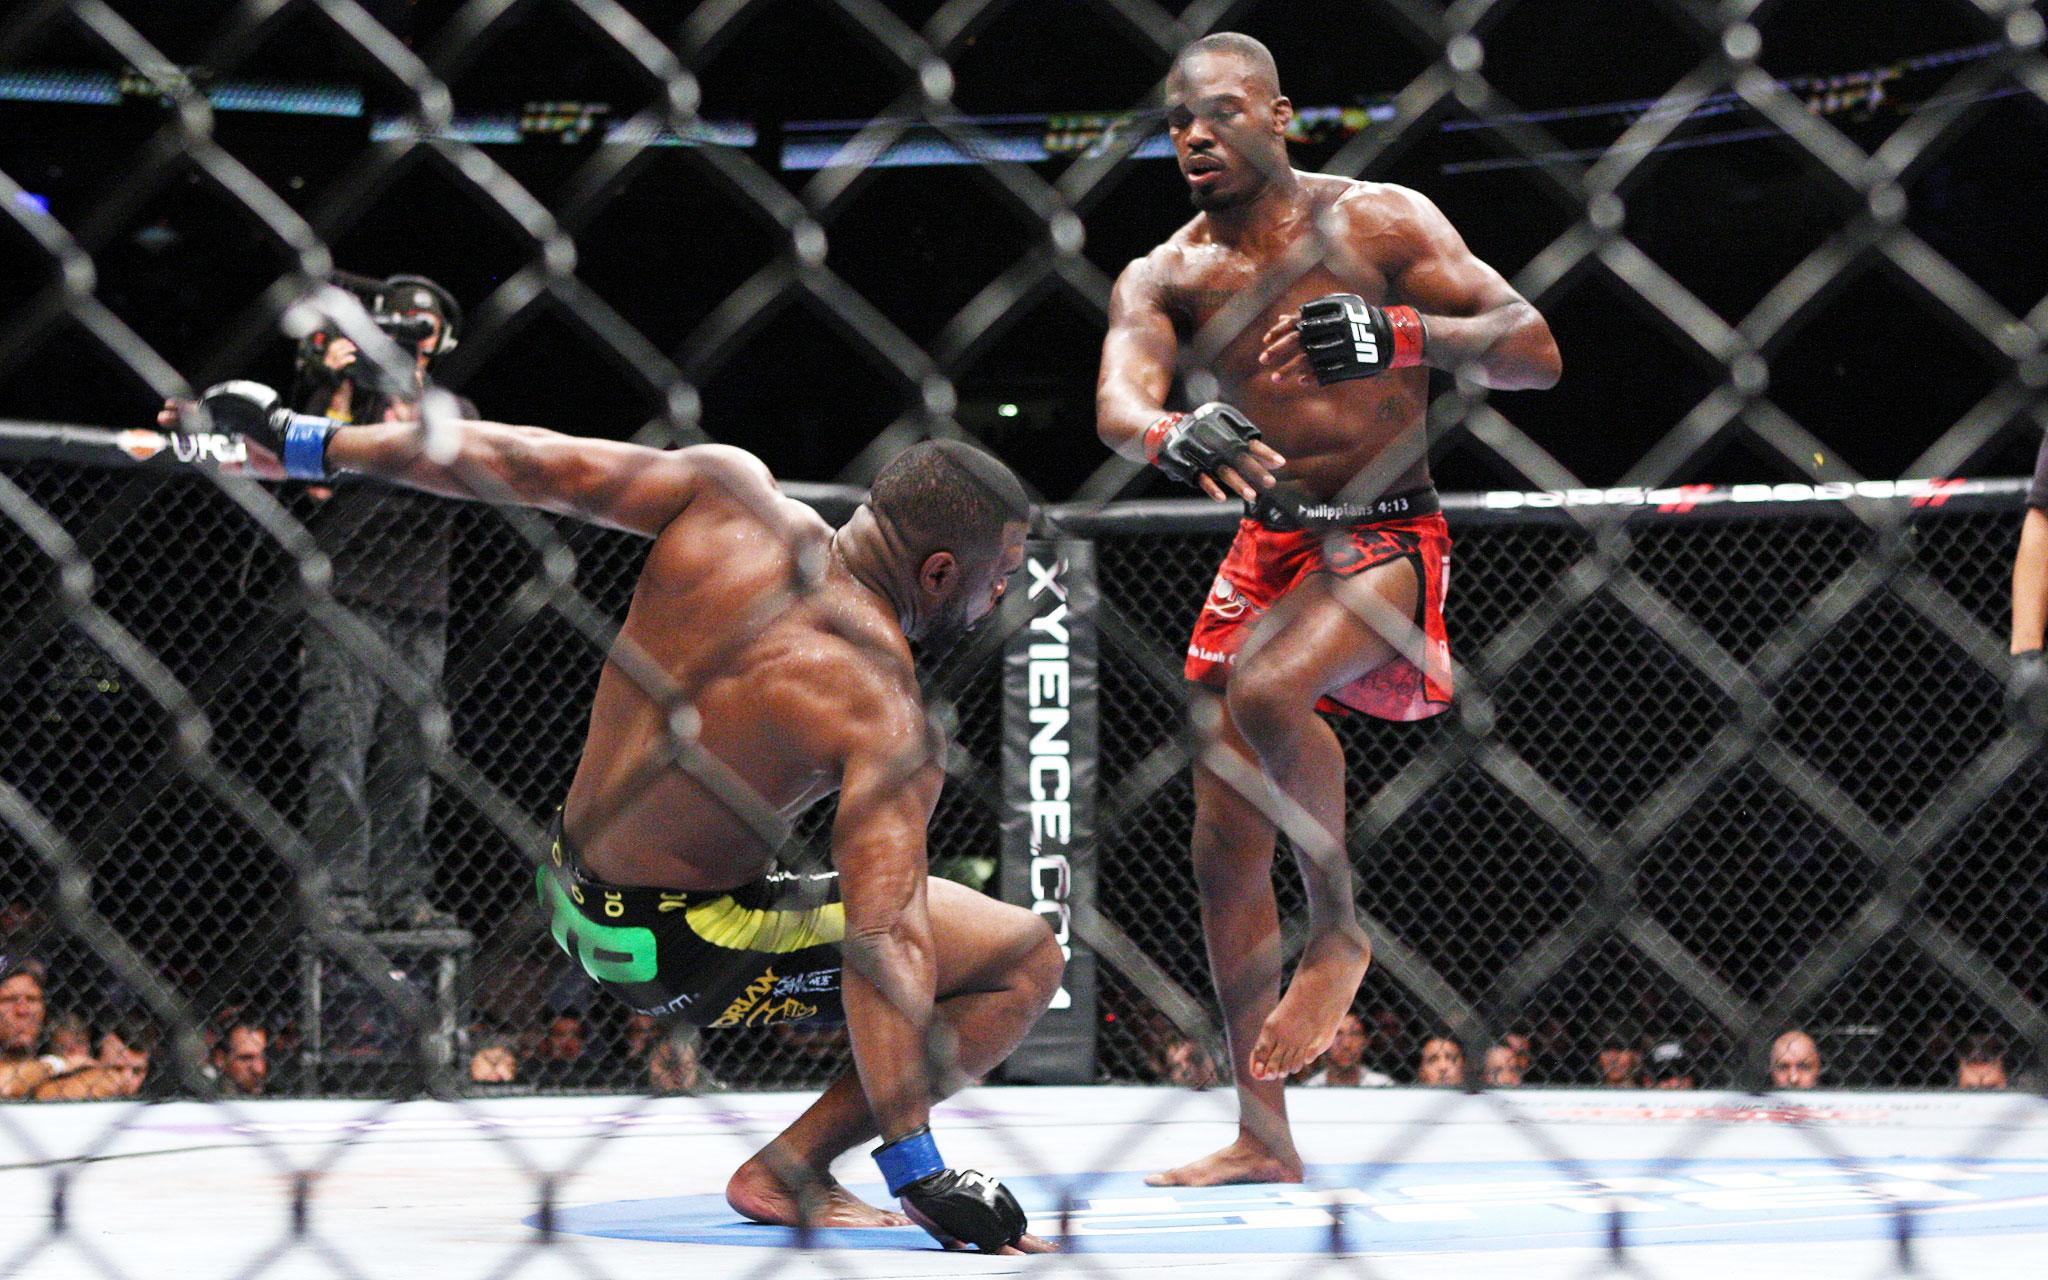 No. 4 -- Rashad Evans: UFC 145